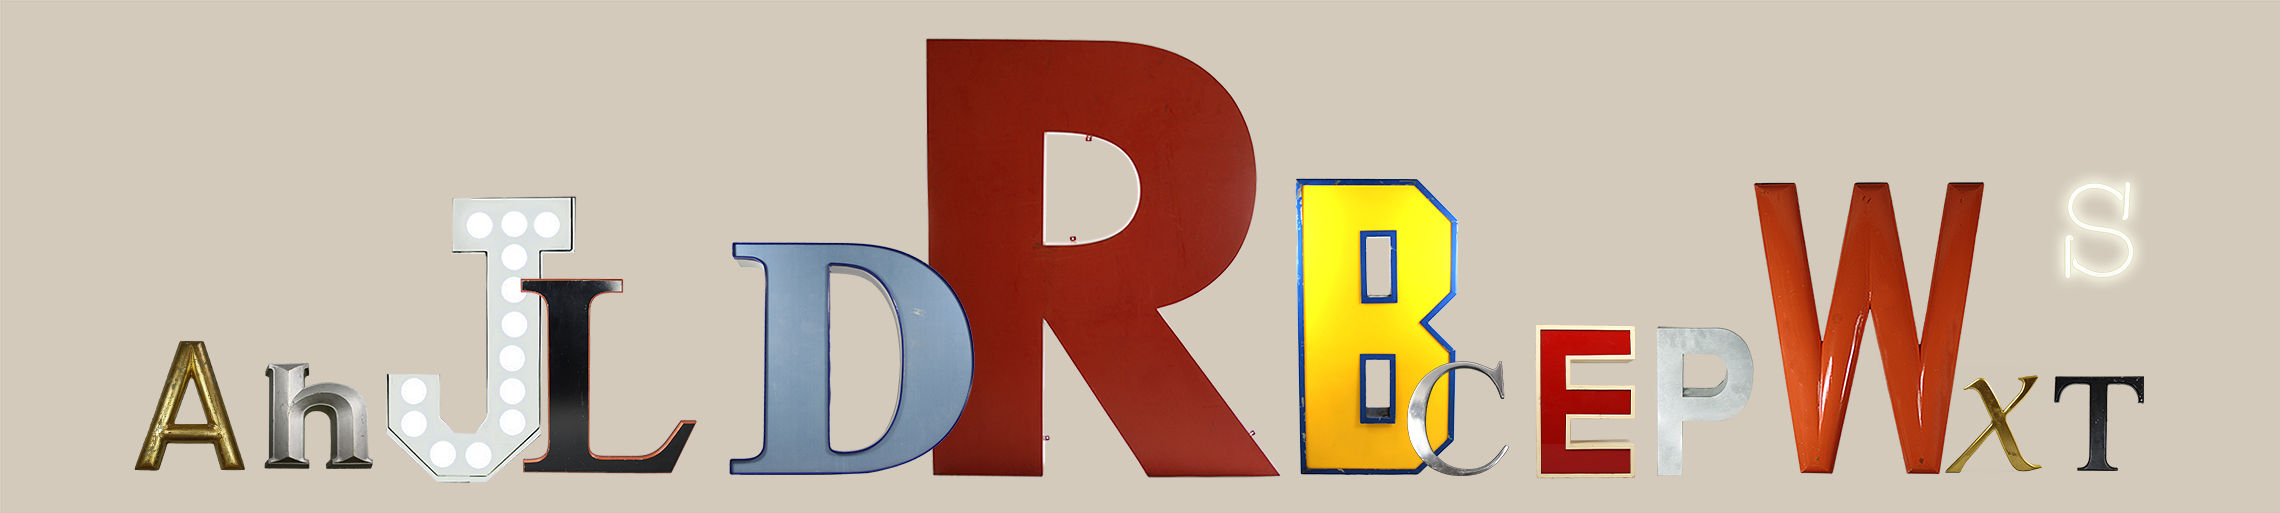 Reclaimed Vintage Letters